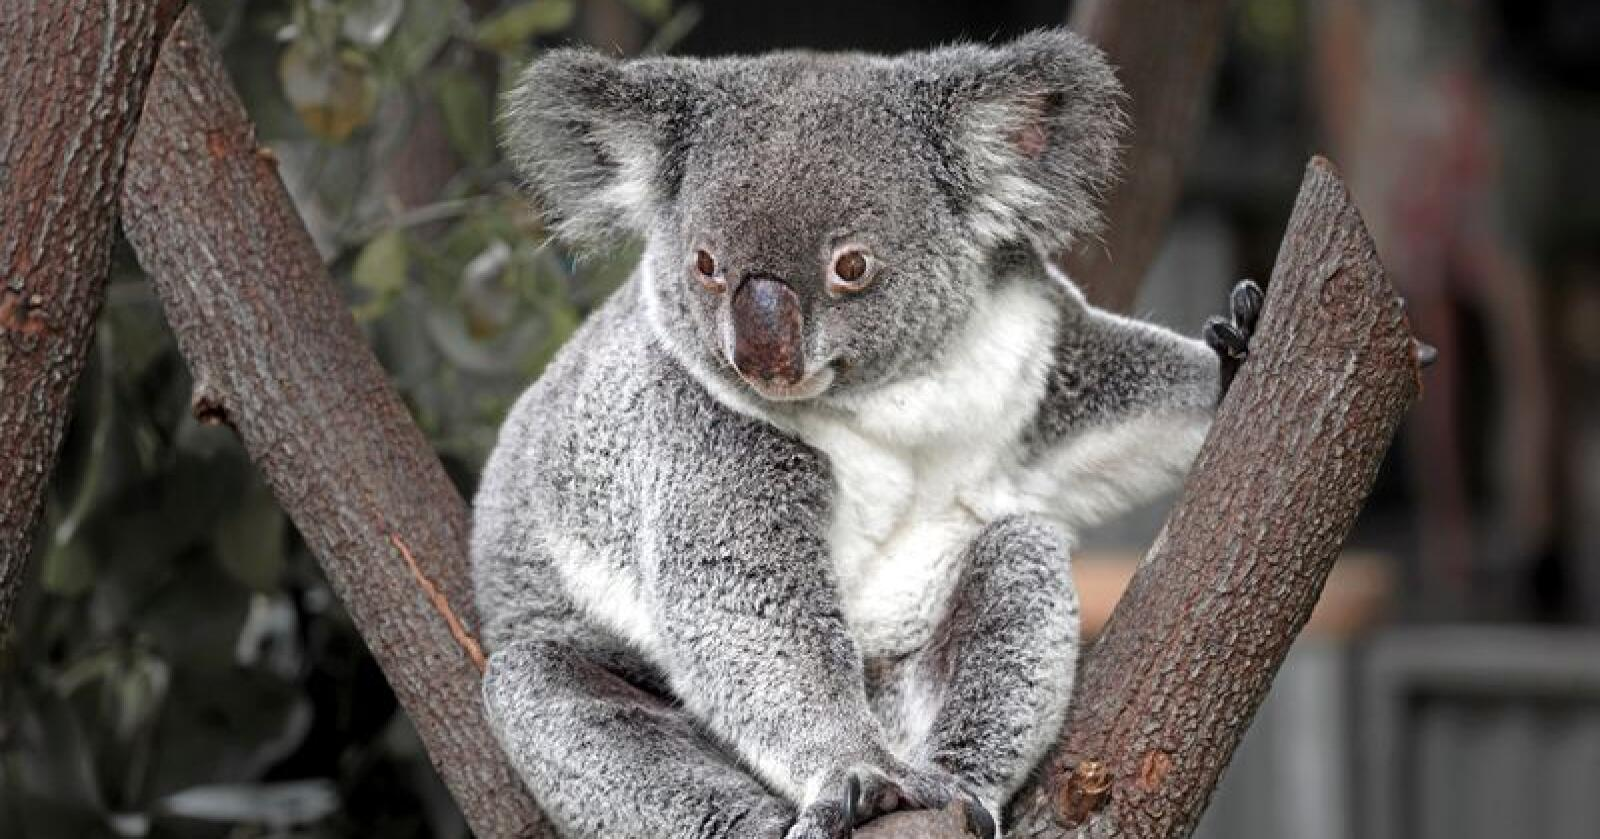 En australsk stiftelse advarer om at koalabjørnens langsiktige overlevelse er truet. Foto: Mostphotos